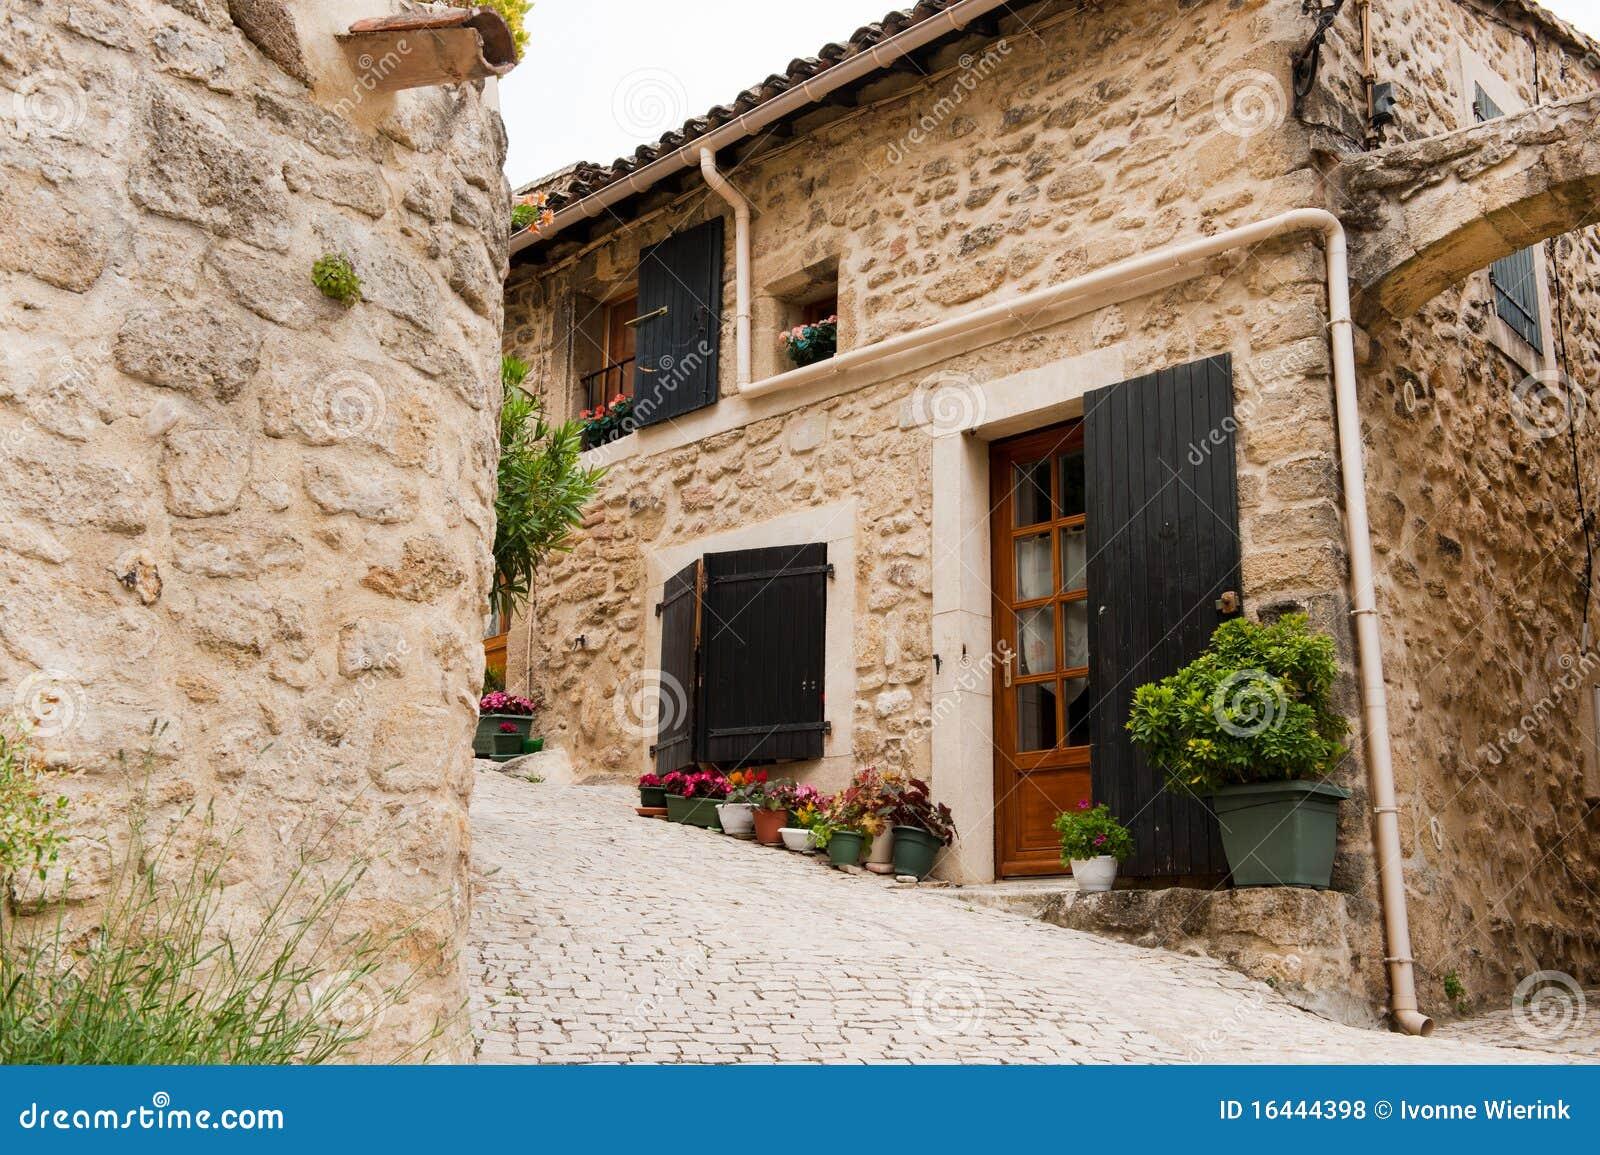 Frans huis stock foto afbeelding bestaande uit frans 16444398 - Foto huis in l ...